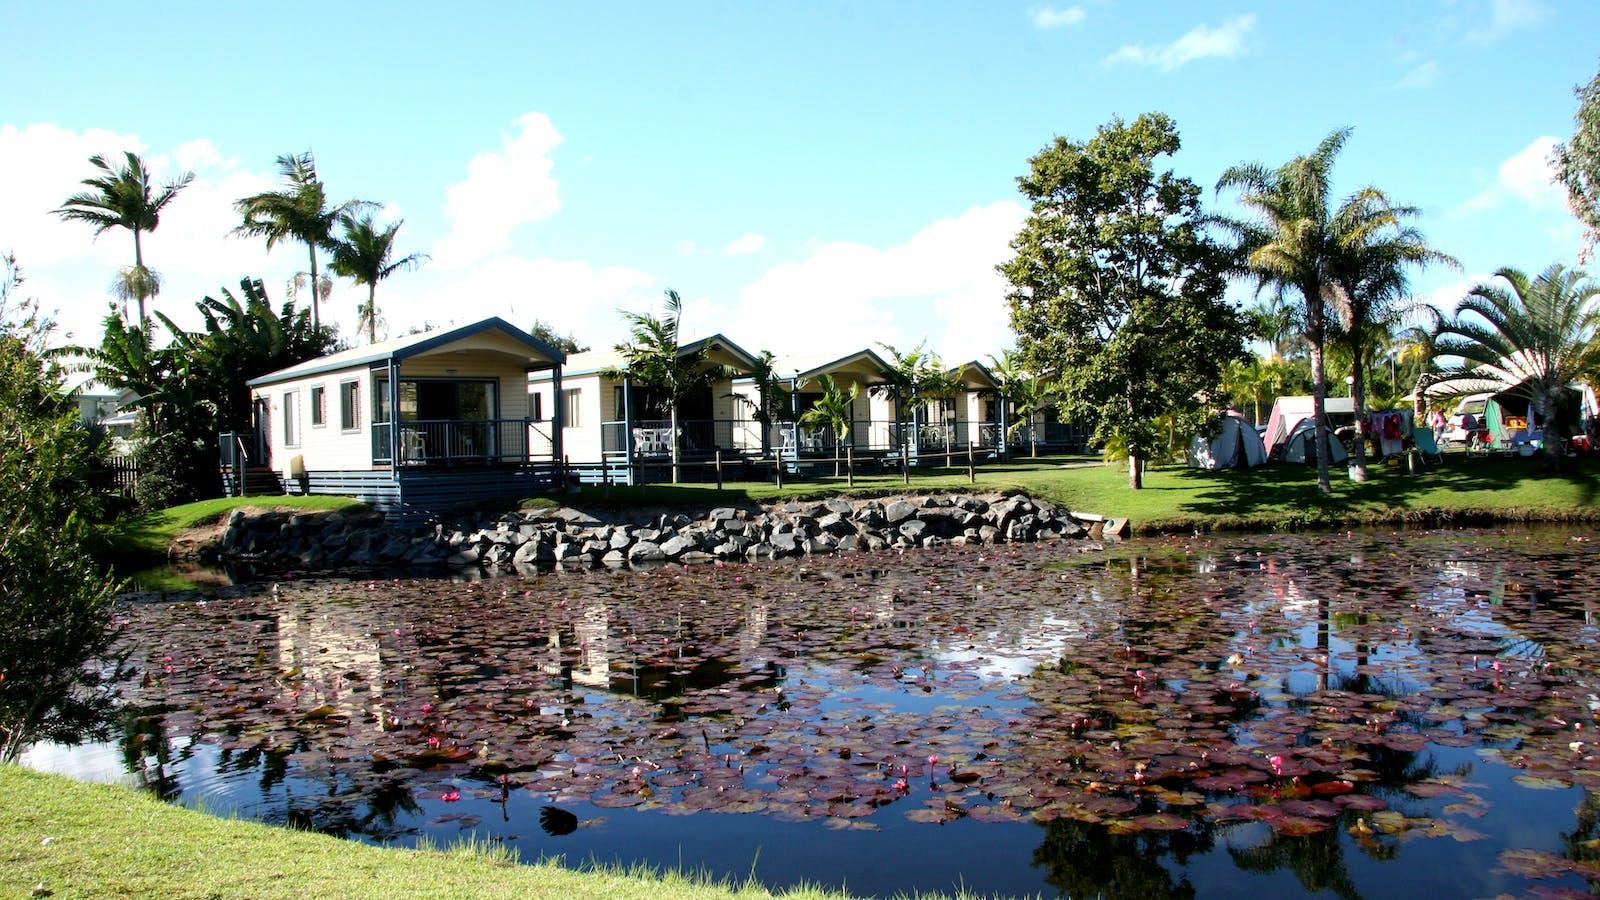 Fraser Lodge Holiday Park - Pond view